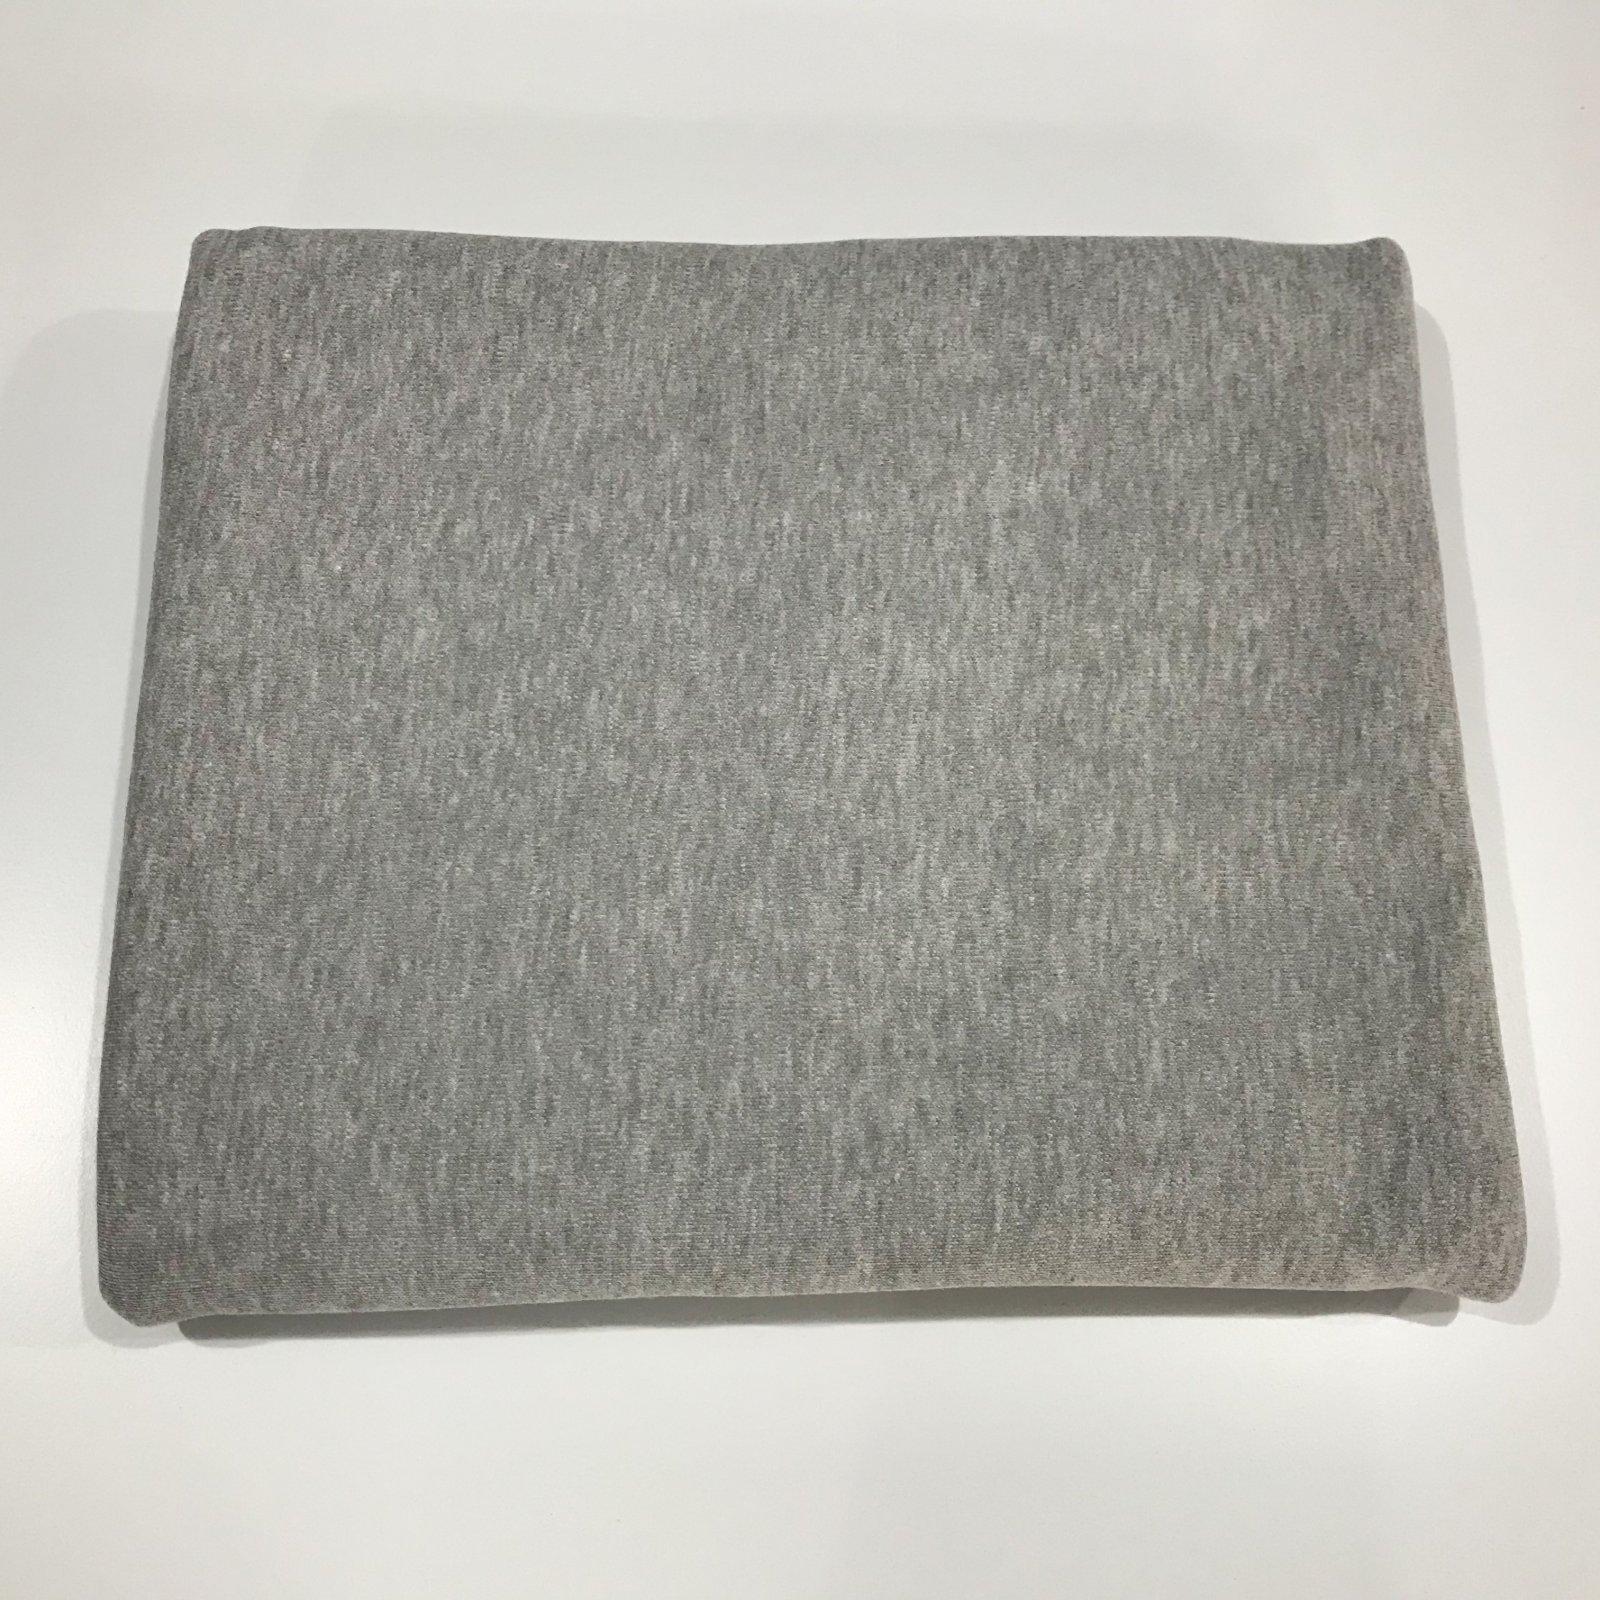 2 yards + 3 inches - Interlock - Grey